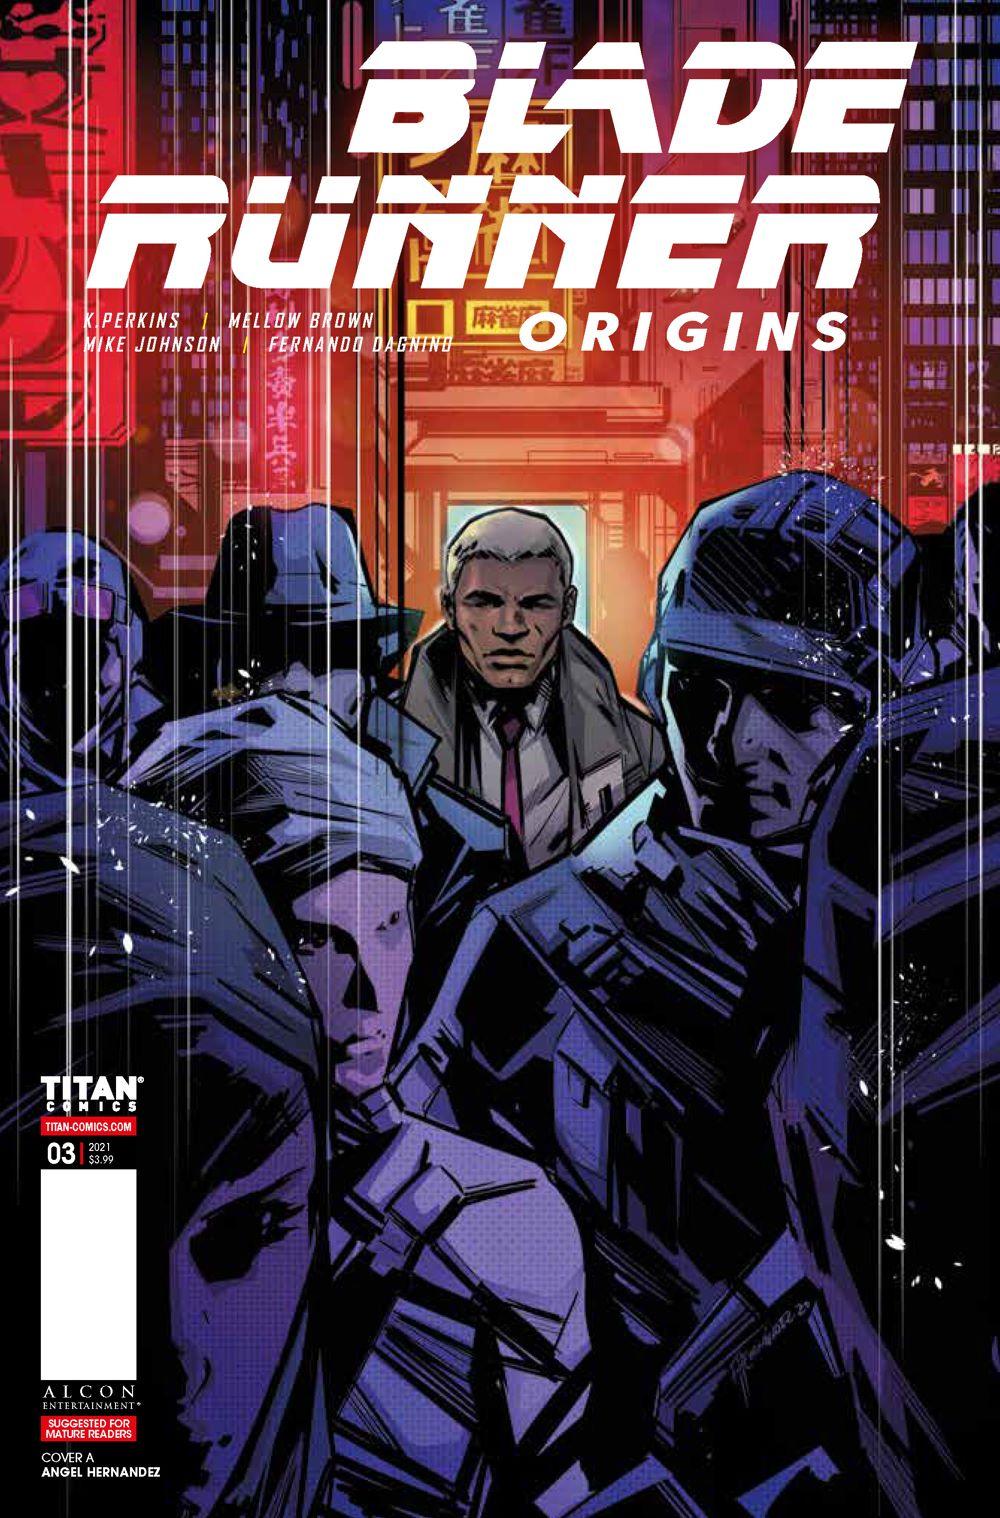 Blade_Runner_Origins_3_COVERS_A-HERNANDEZ ComicList: Titan Comics New Releases for 04/21/2021